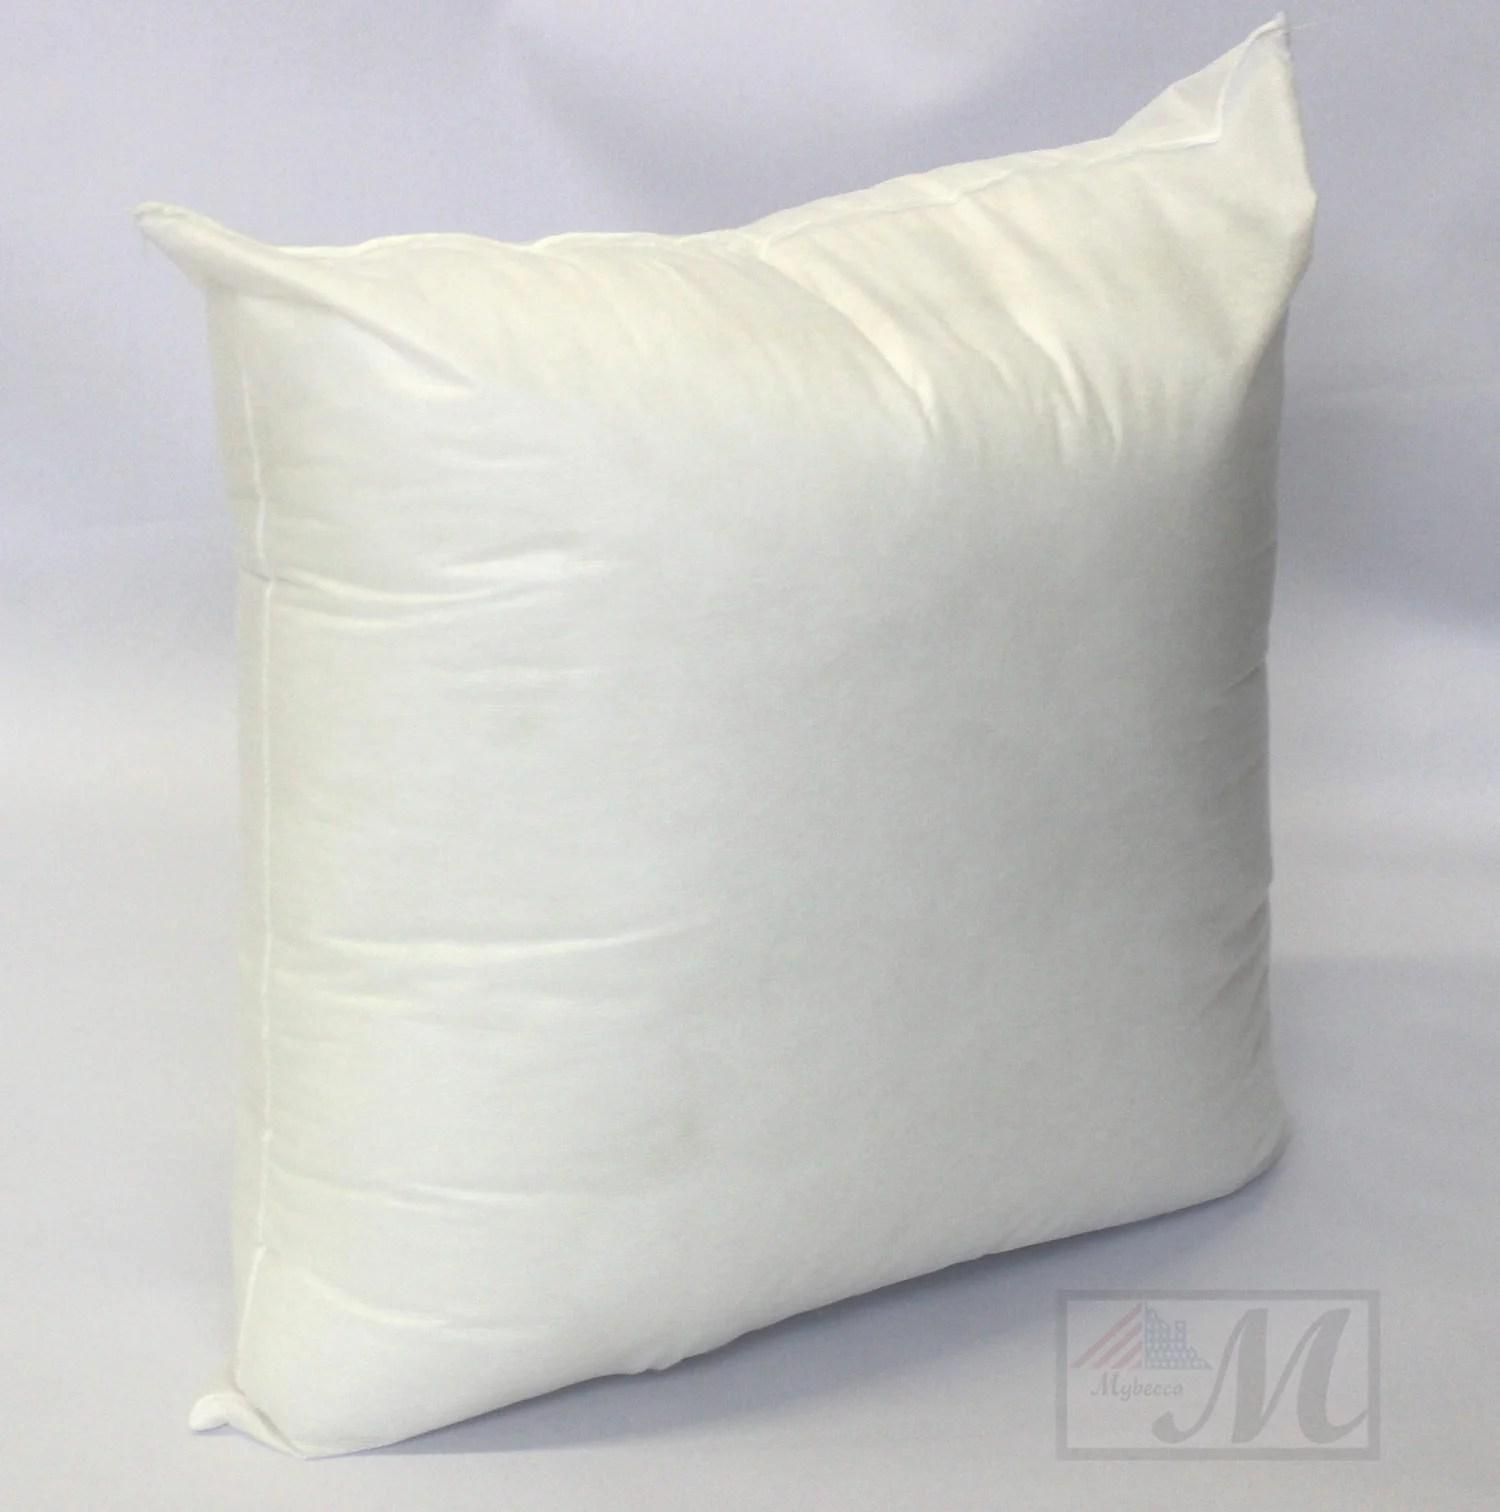 mybecca 18 l x 18 w pillow sham stuffer white square hypoallergenic pillow insert first quality